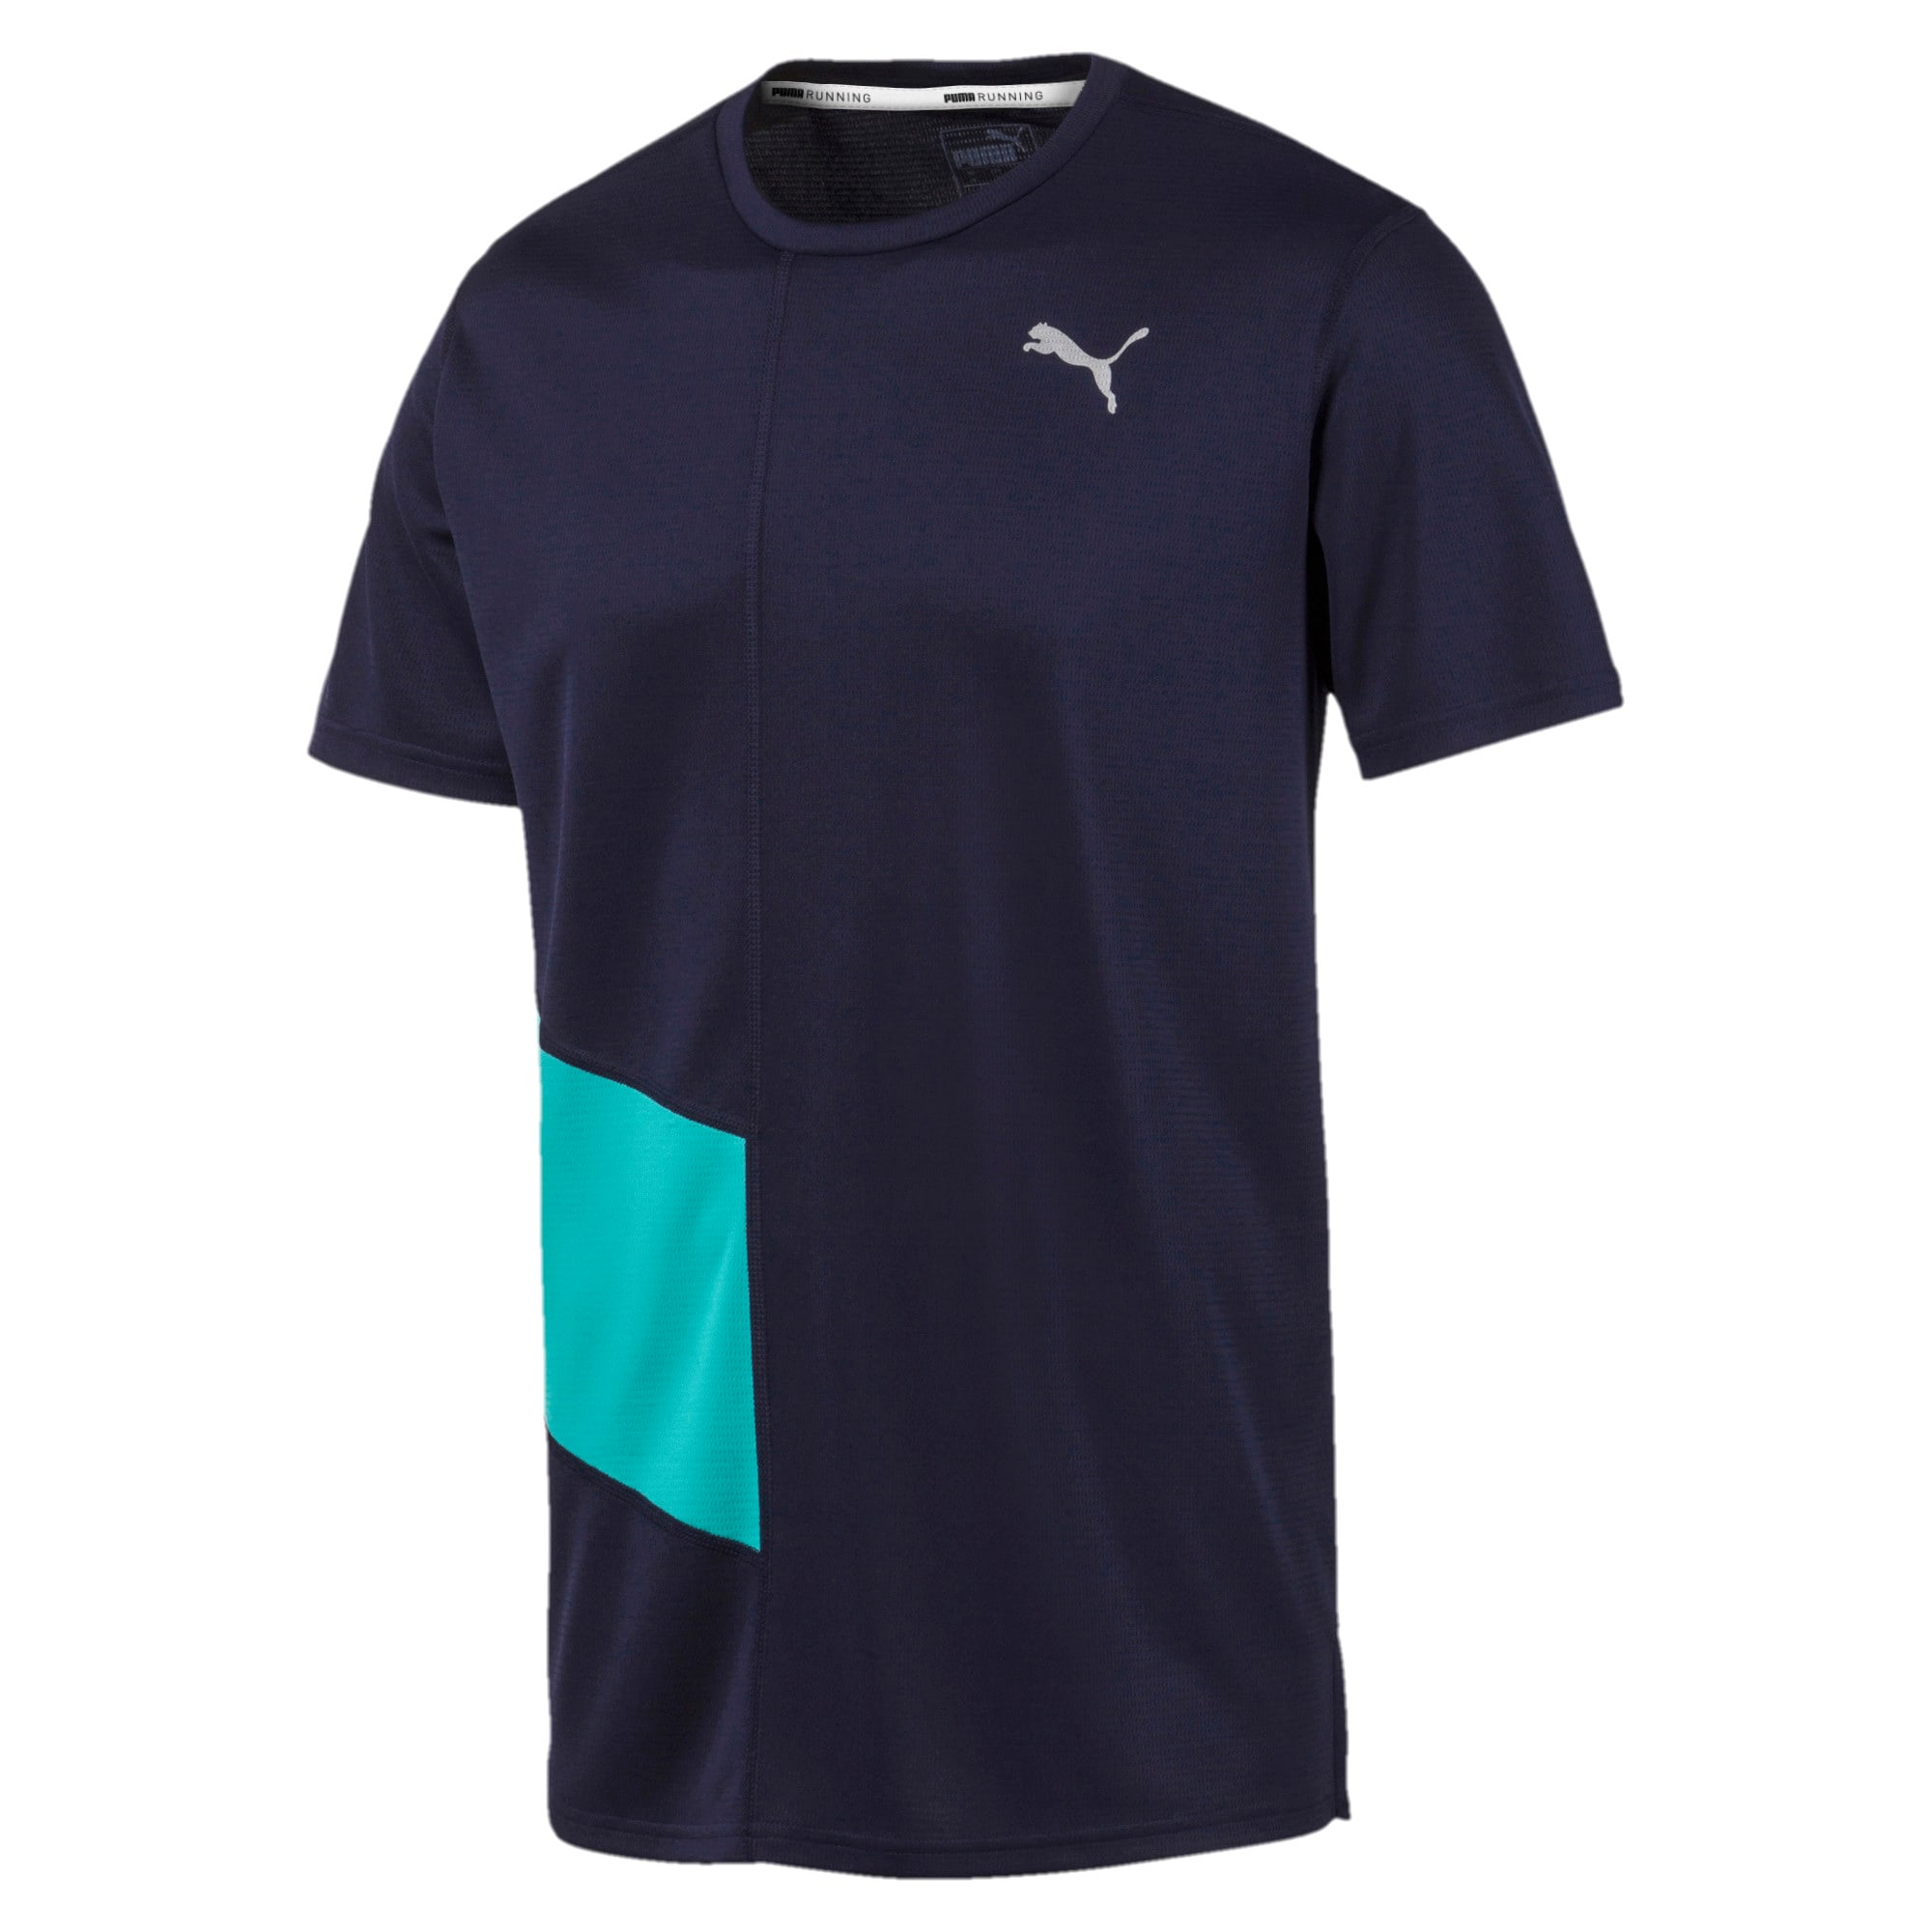 Thumbnail 4 van IGNITE hardloopshirt voor mannen, Peacoat-blauwturquoise, medium